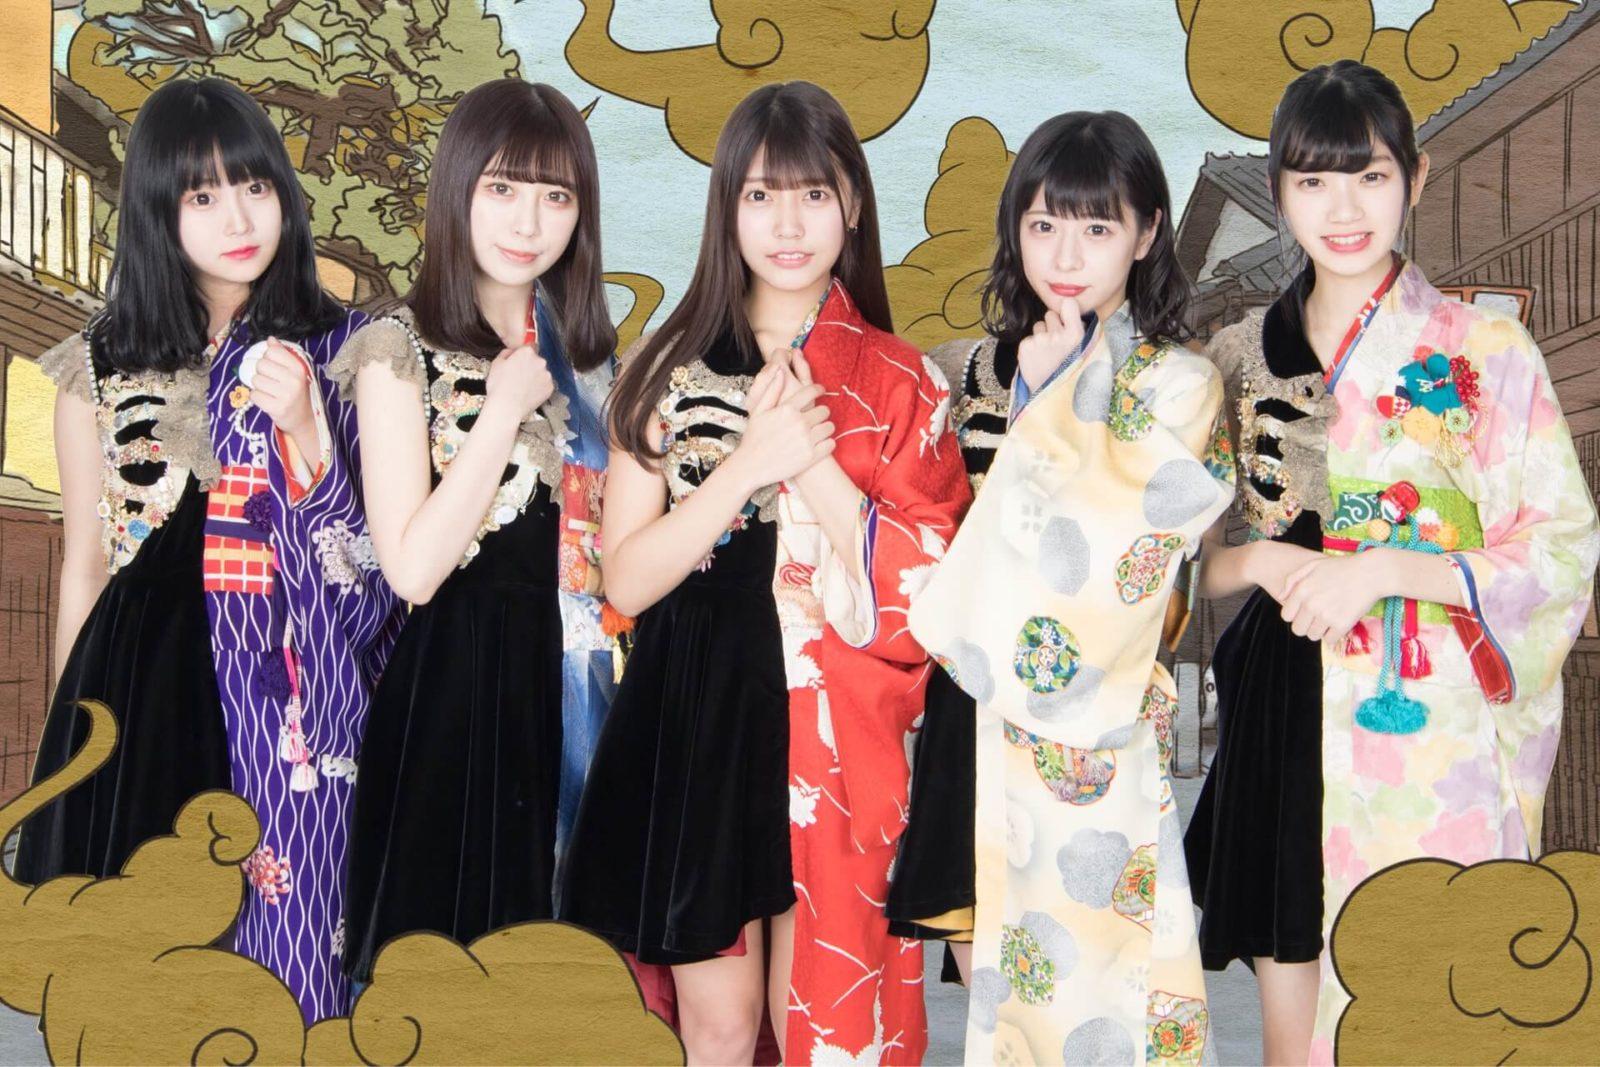 @JAM 2019 Day2〜SUPER LIVE〜第2弾出演者として神宿、まねきケチャの2組を発表サムネイル画像